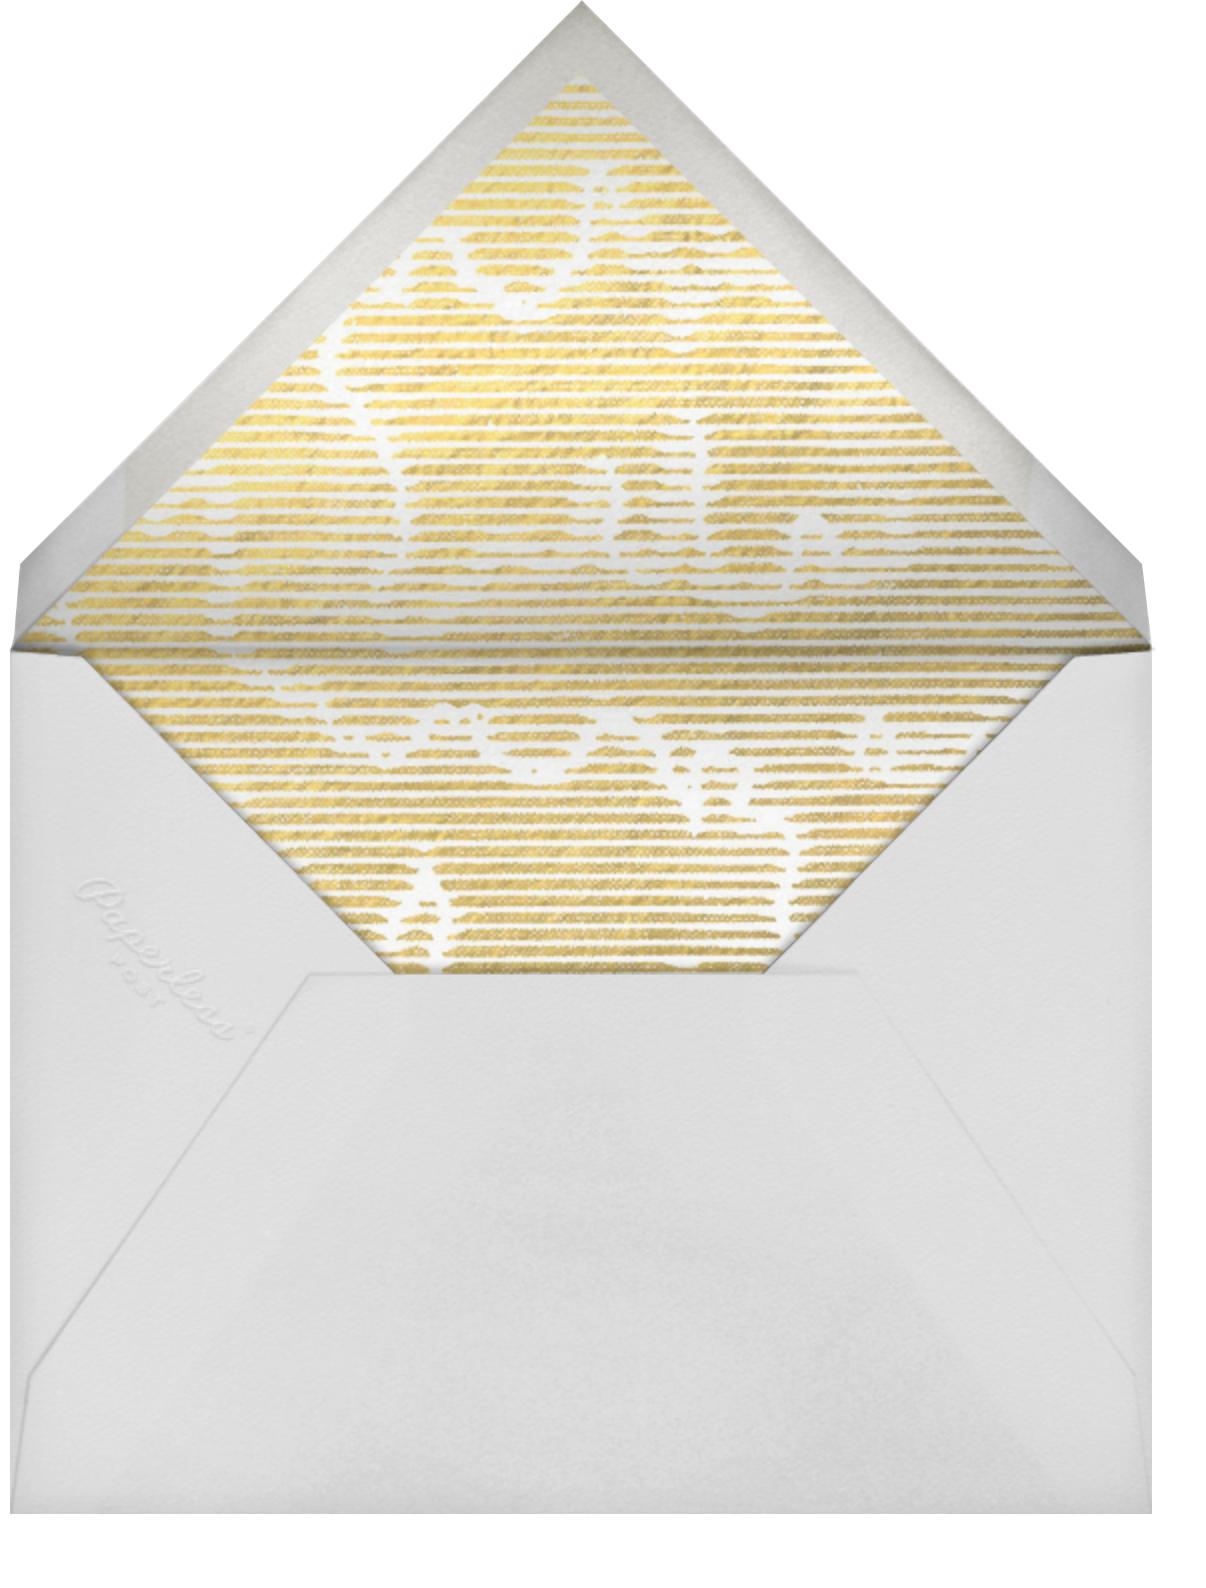 Acclaim - Kelly Wearstler - Adult birthday - envelope back